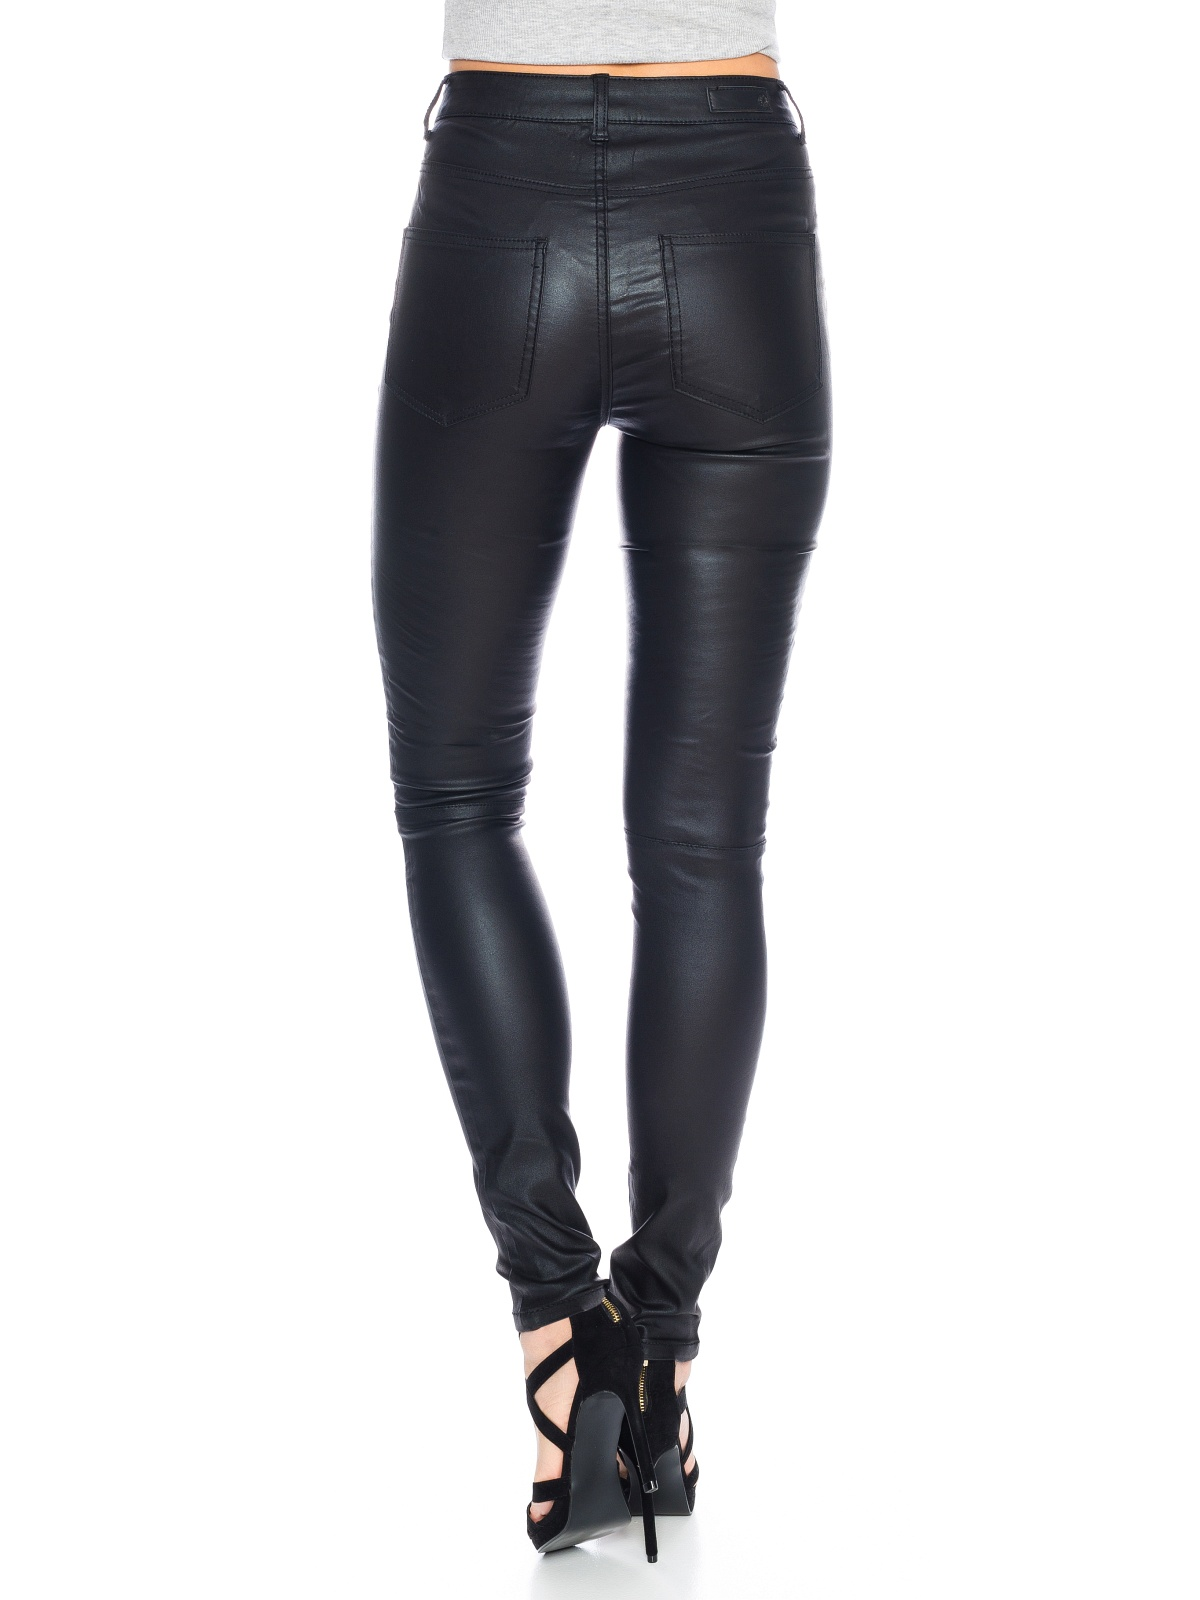 pieces damen biker hose legging pcjust 17071622 schwarz damen jeans. Black Bedroom Furniture Sets. Home Design Ideas